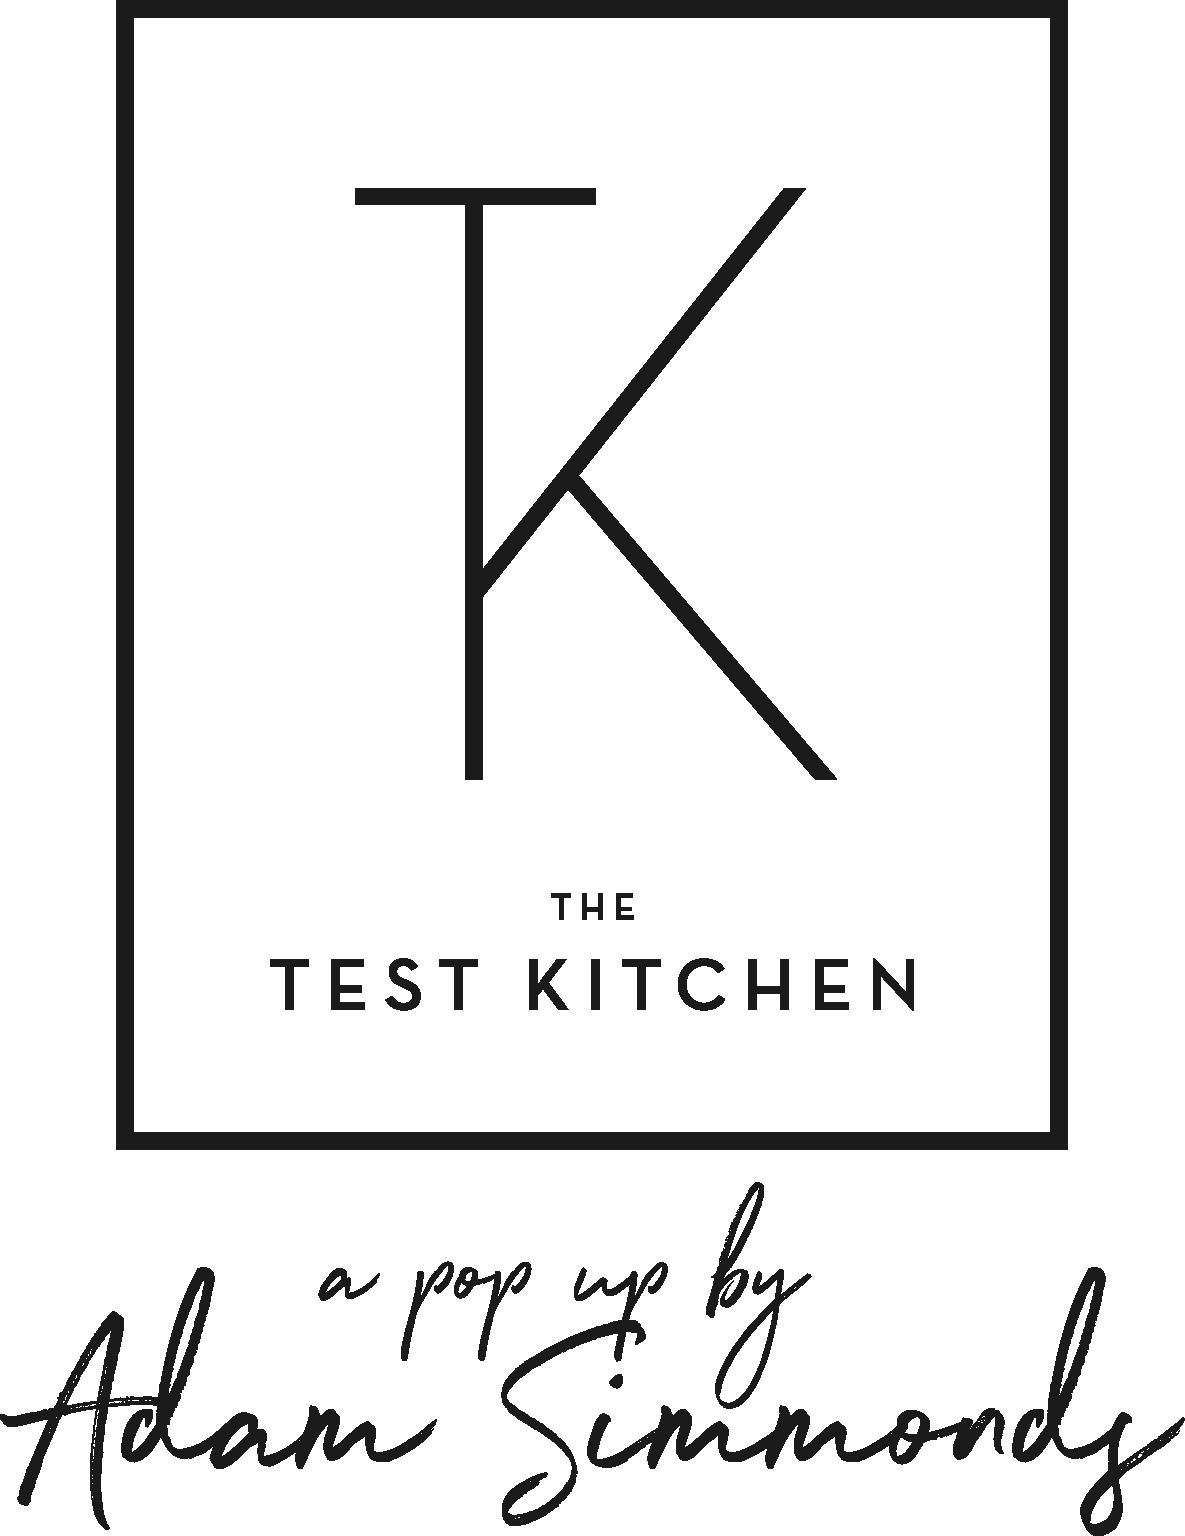 THE TEST KITCHEN | Travel Europe UK | Pinterest | Test kitchen ...